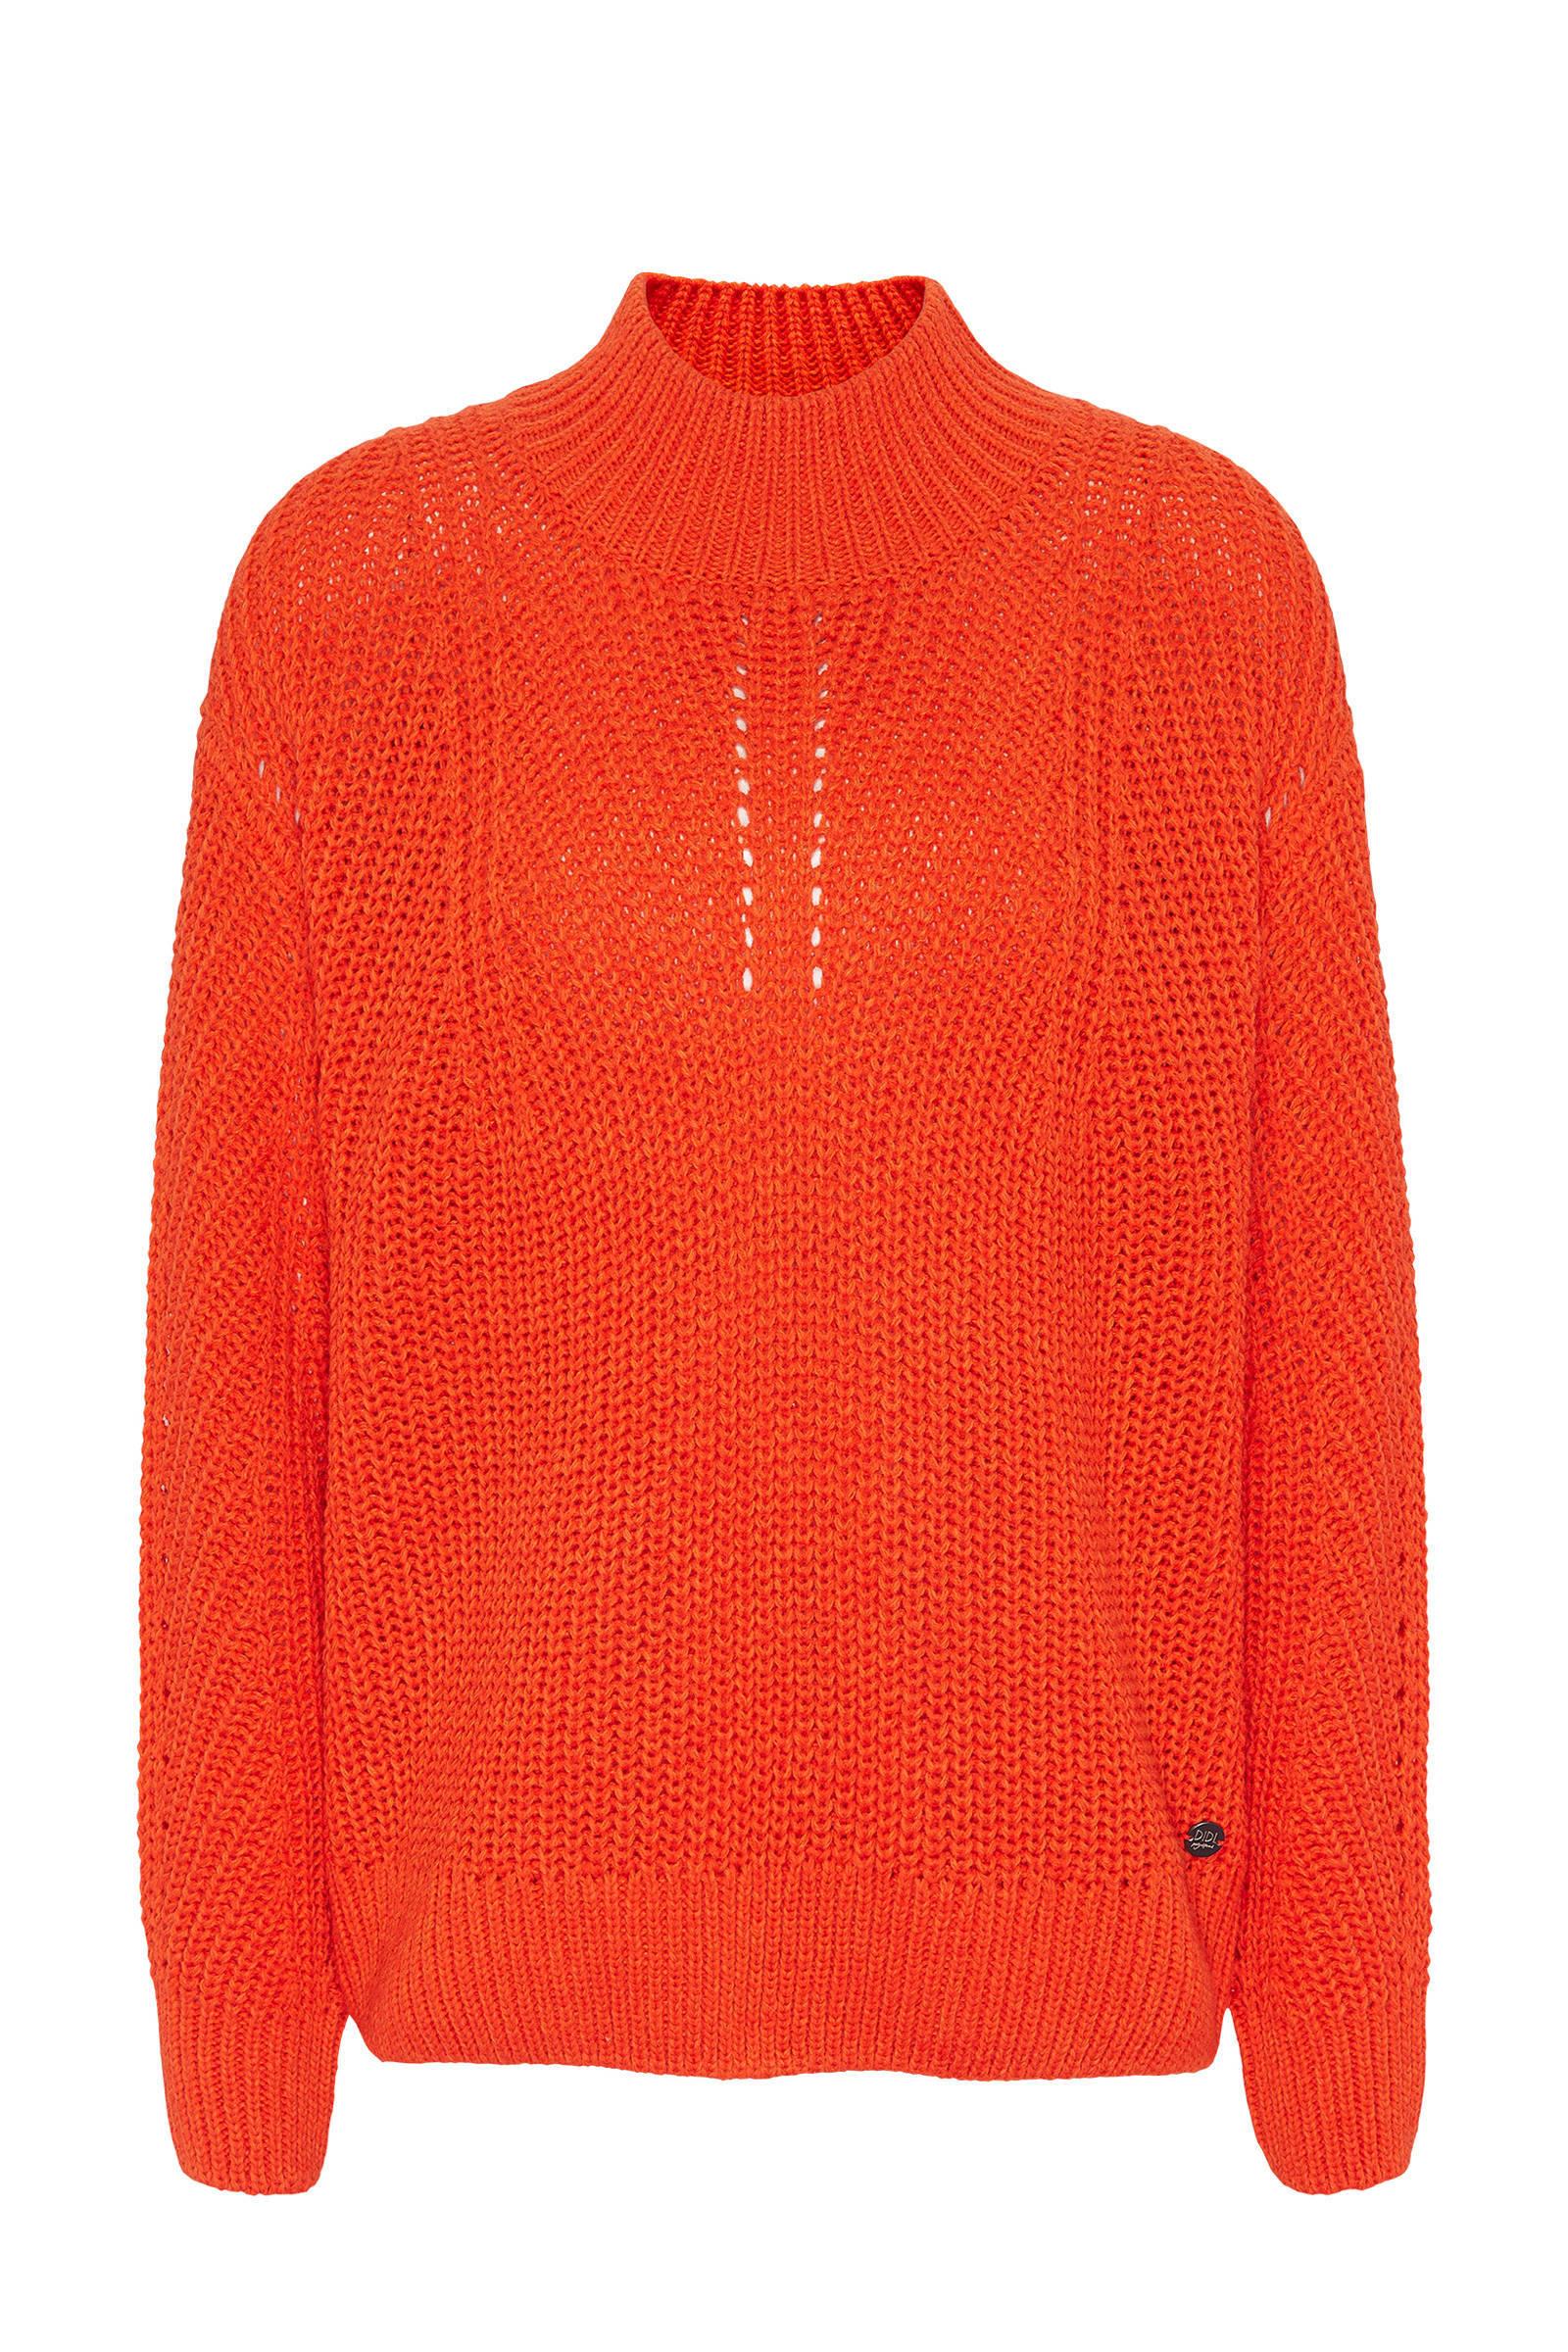 lowest price 64509 69938 didi-gebreide-trui-oranje-koraalrood.jpg